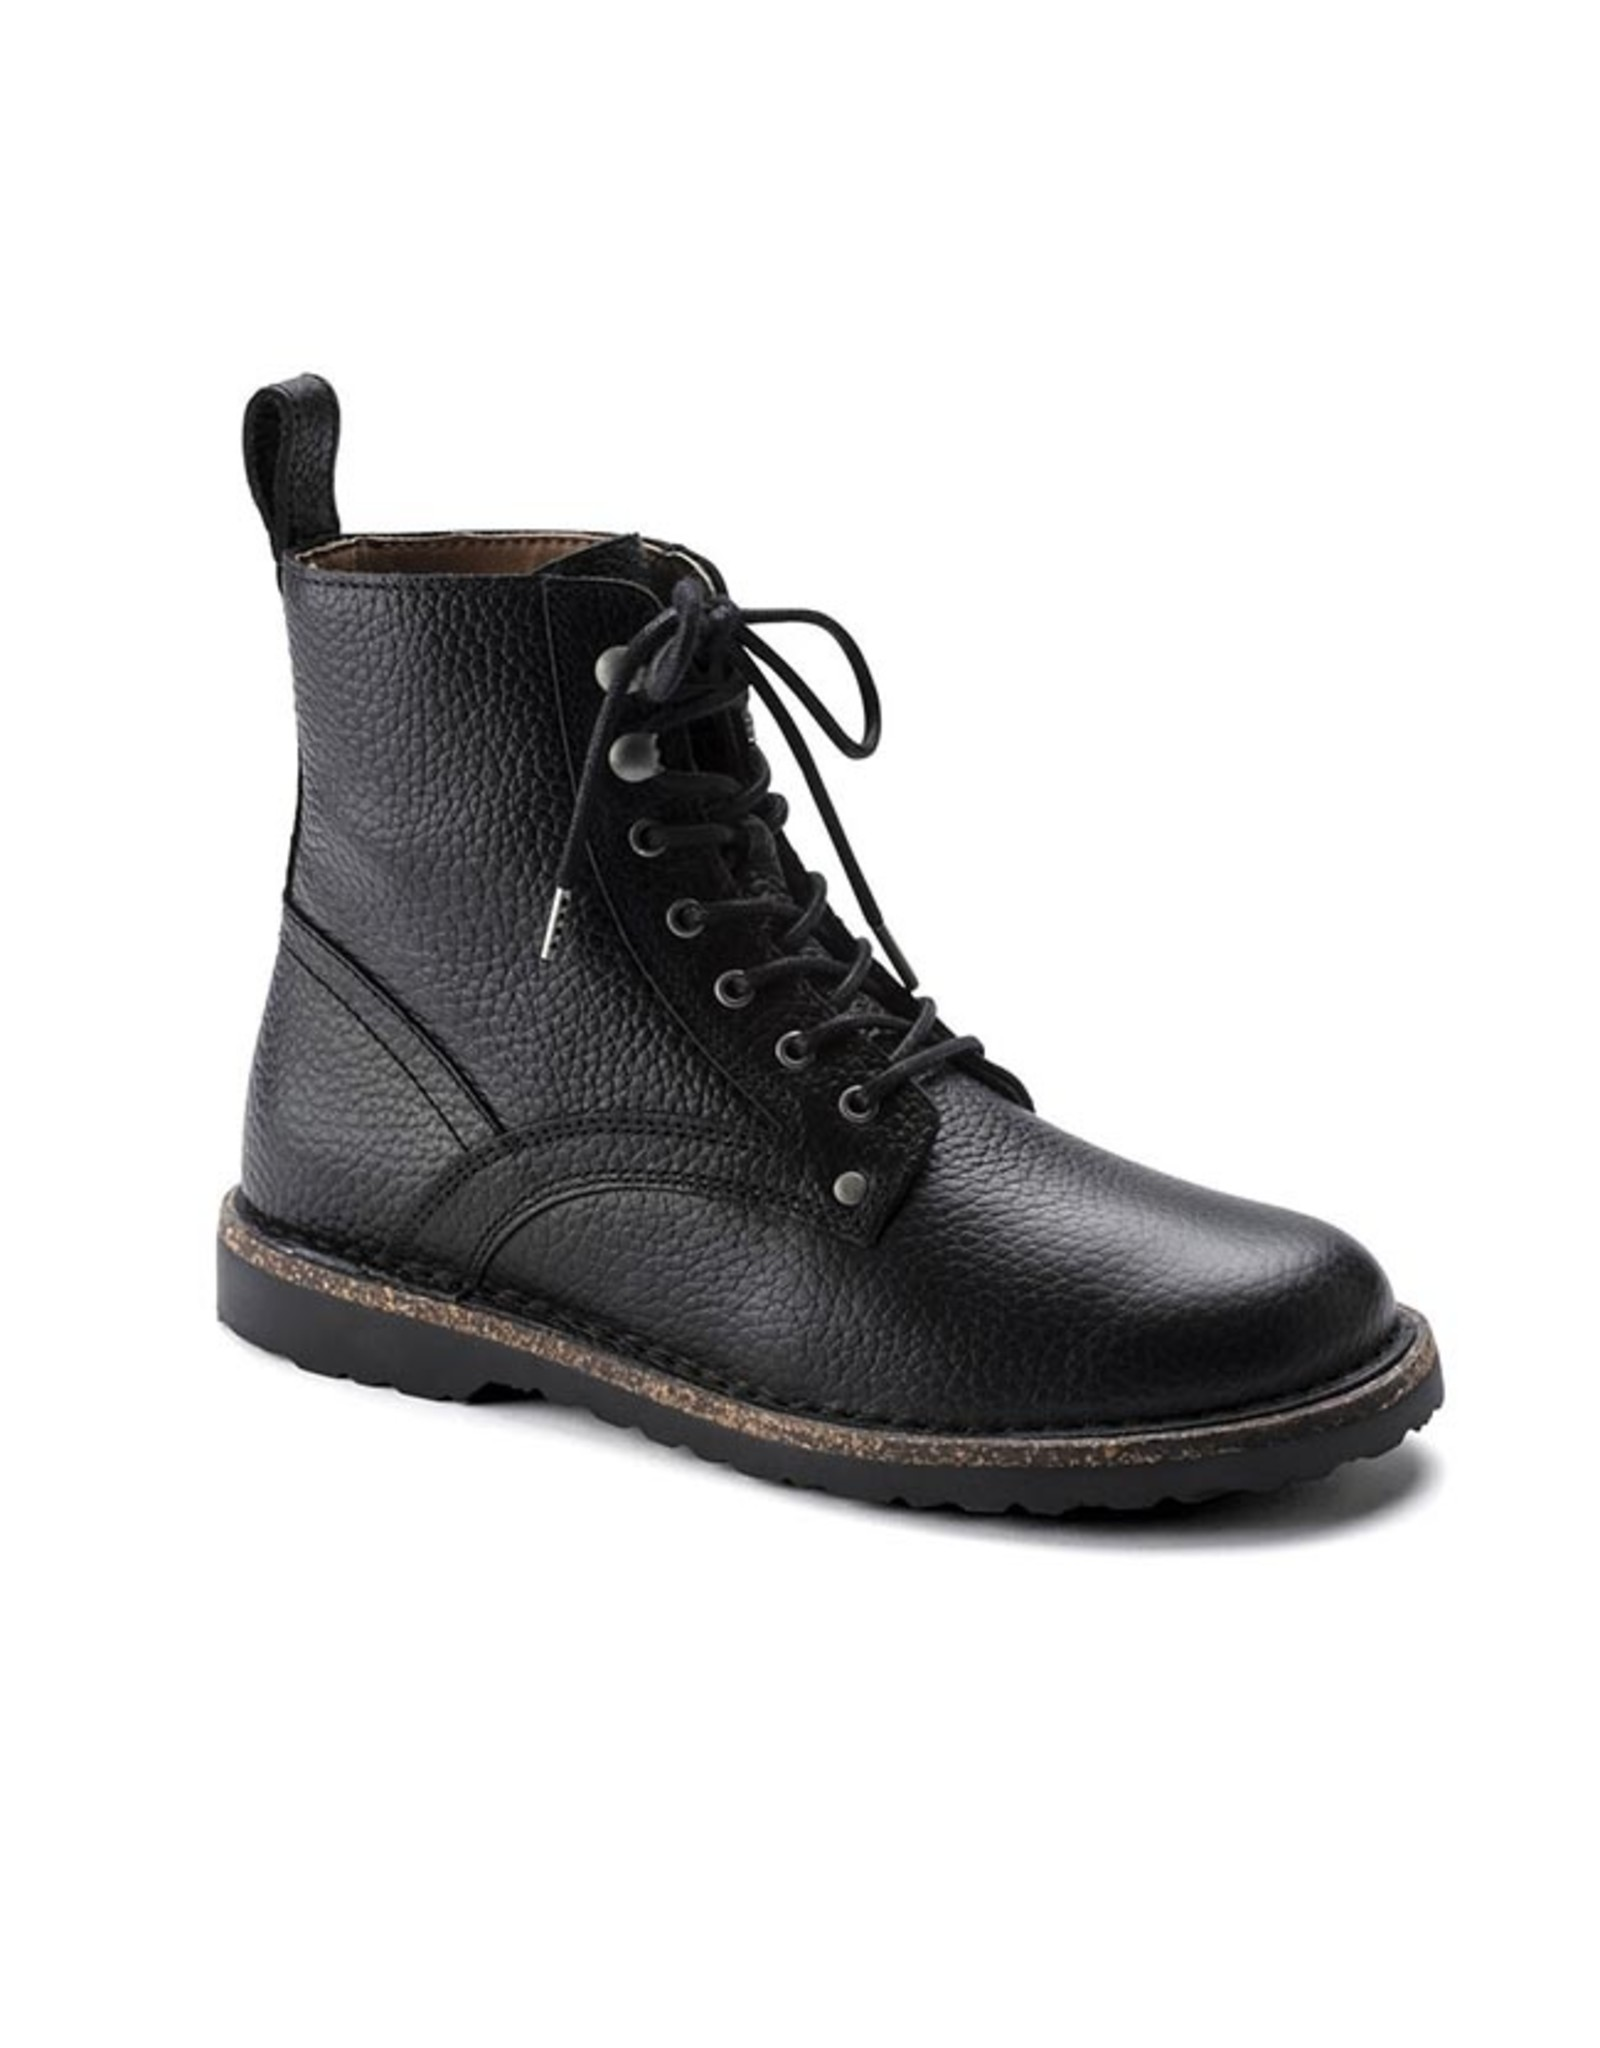 BIRKENSTOCK Bryson Black R BR-BLE-R 1017279